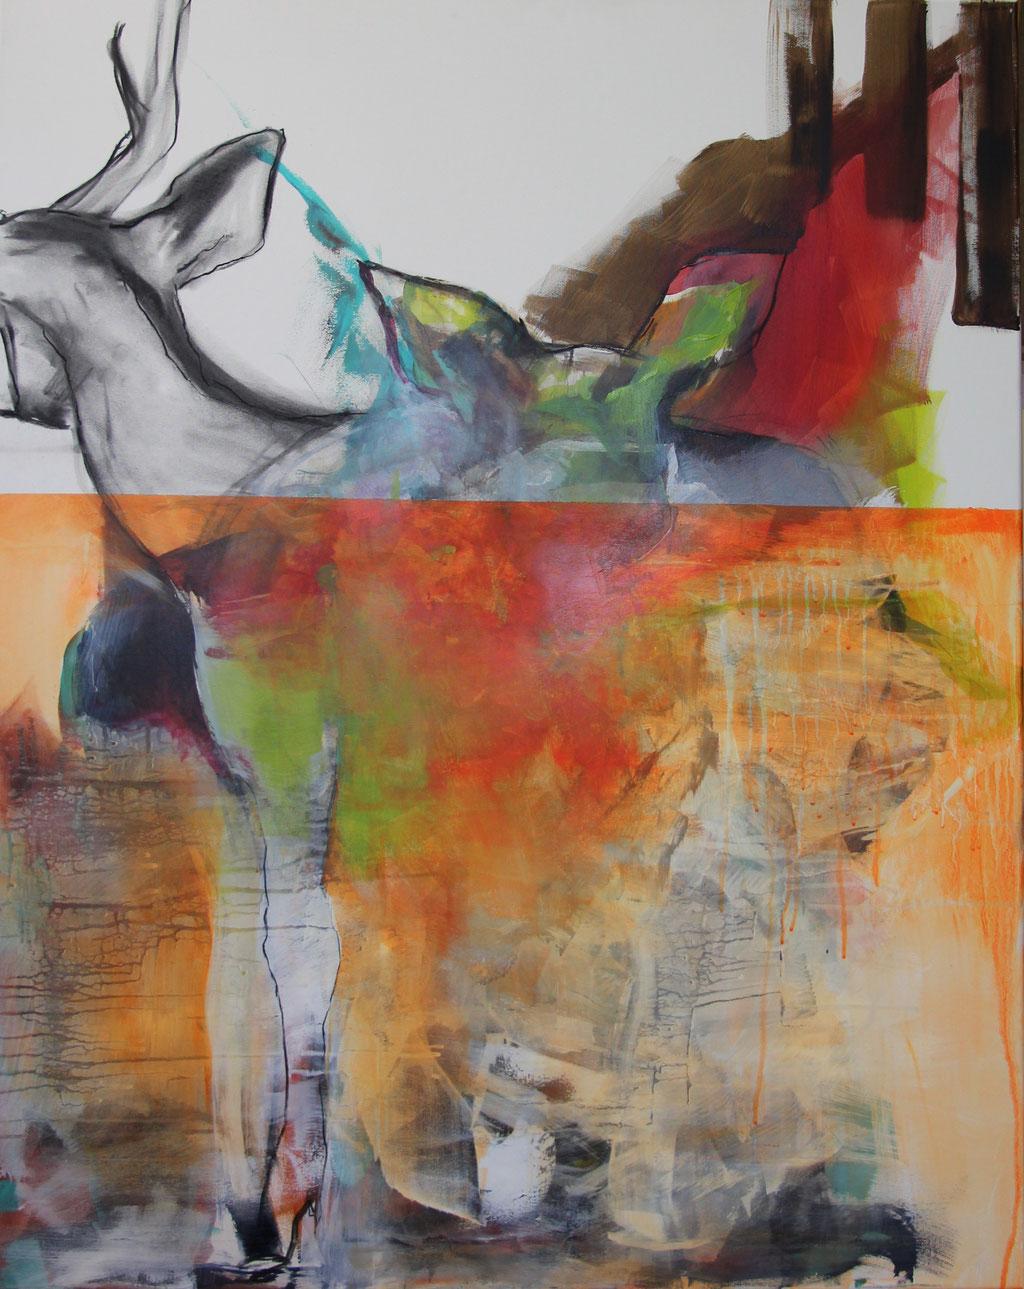 o.T. -  Acryl, Kohle, Kreide auf Leinwand   100 cm x 80 cm